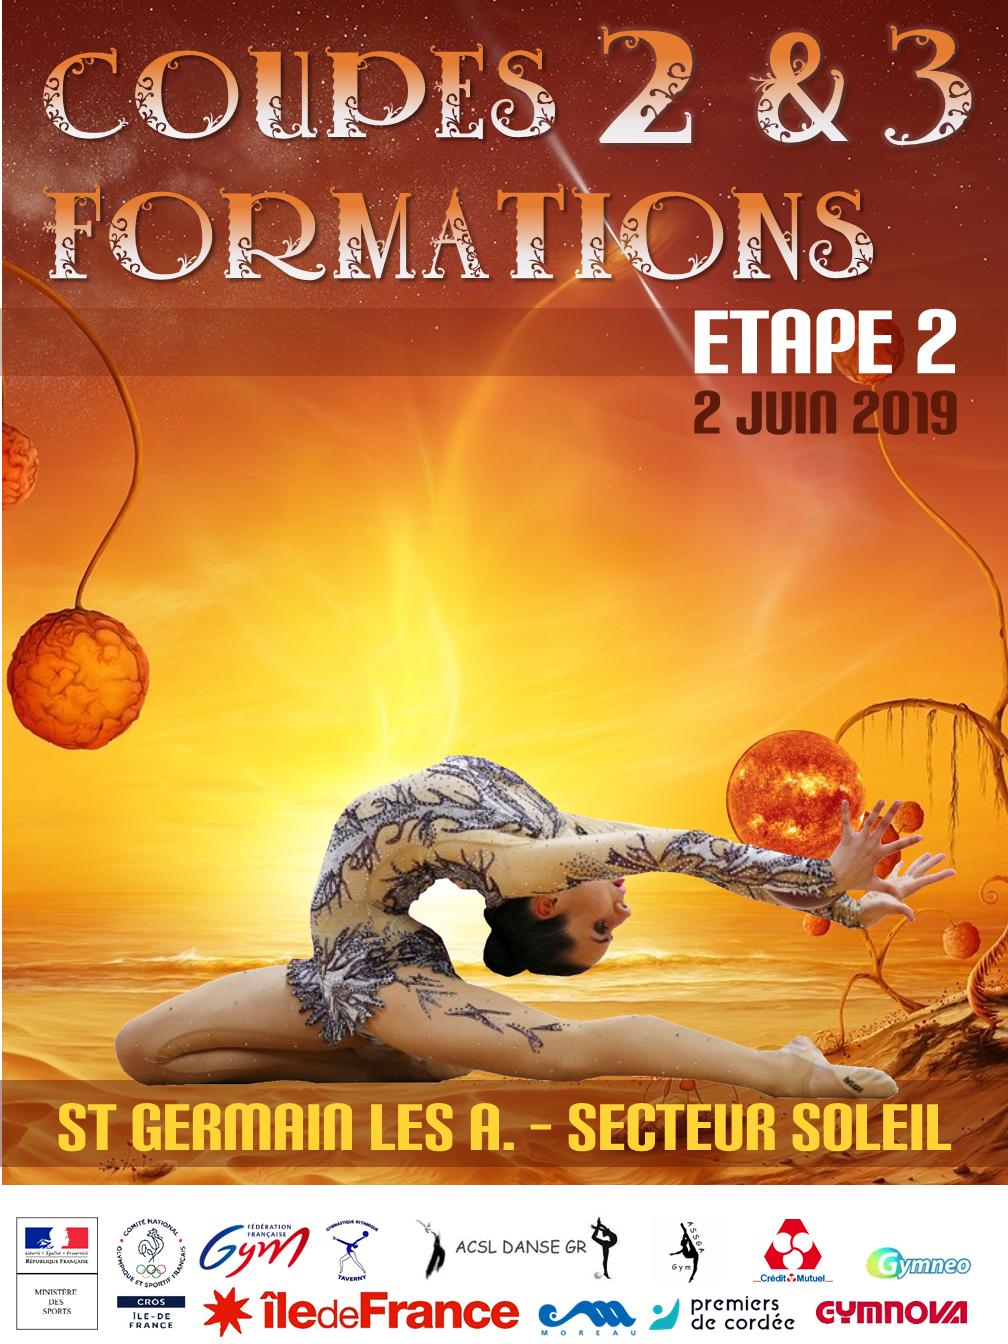 Coupe Formation Etape 2